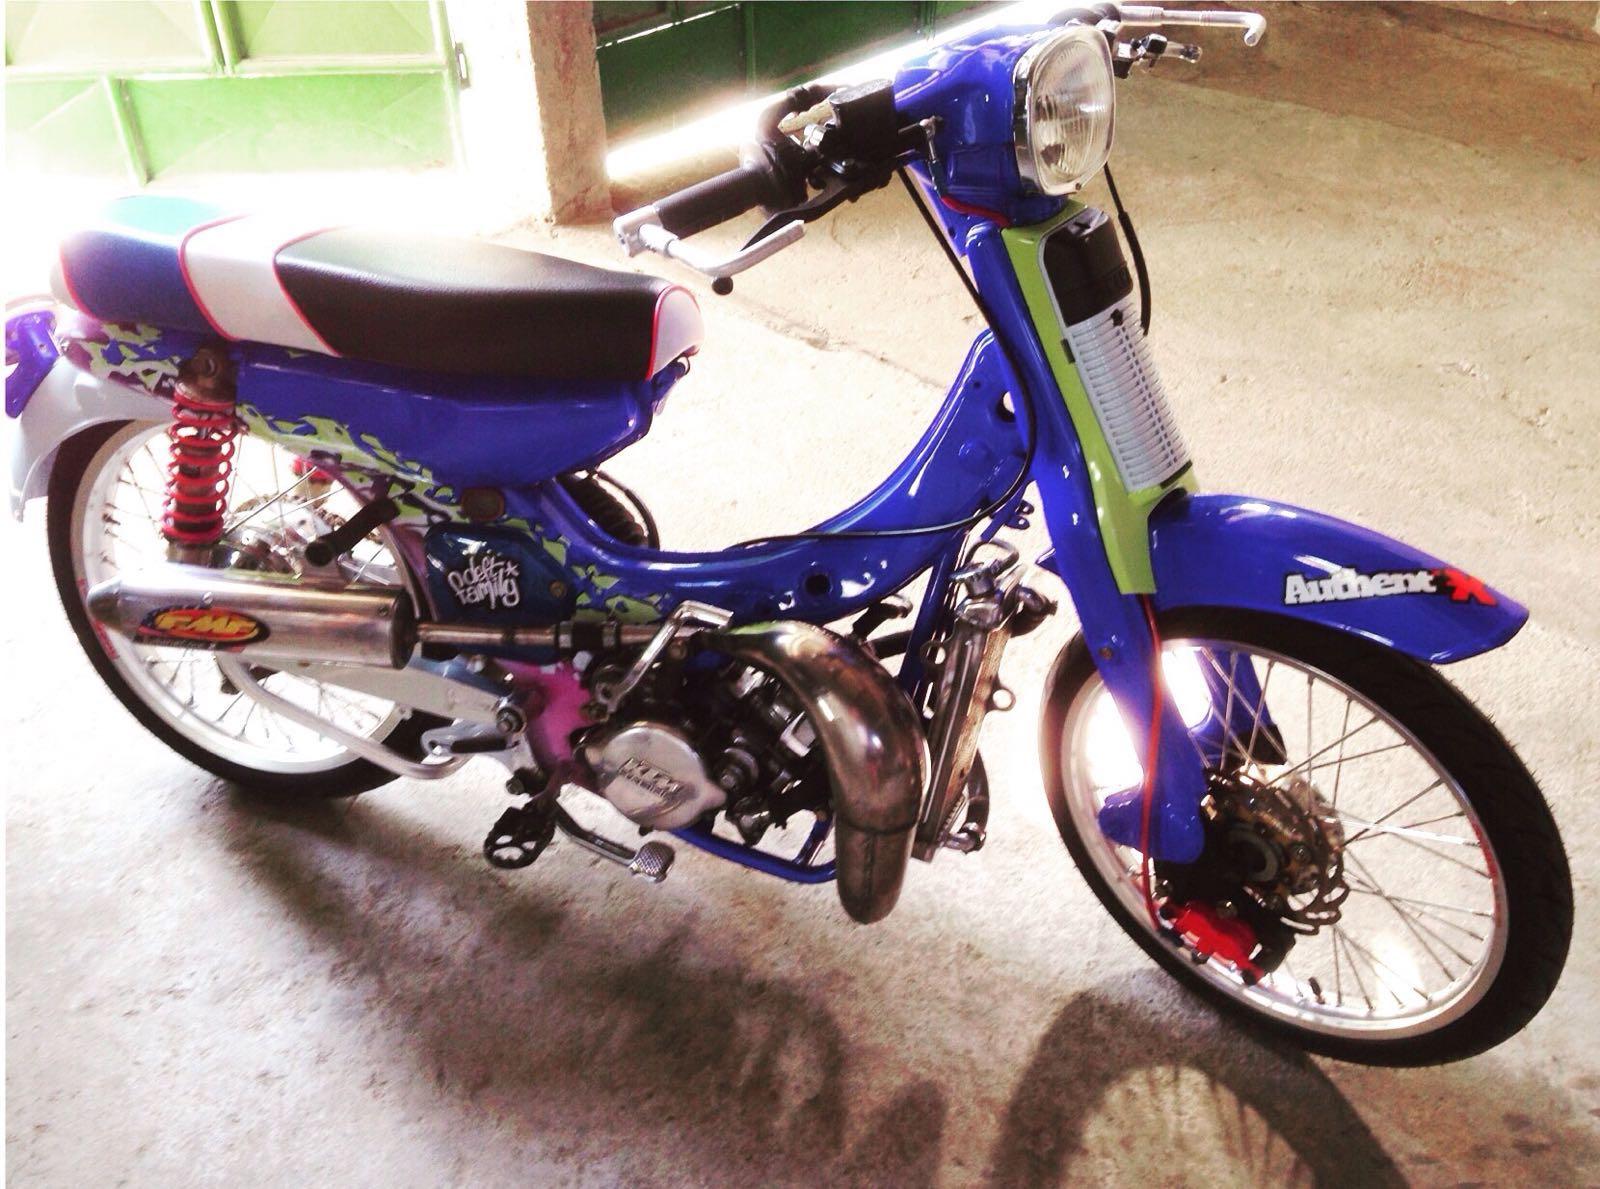 Ide 52 Modifikasi Motor Yamaha V75 Terunik Sumped Motor